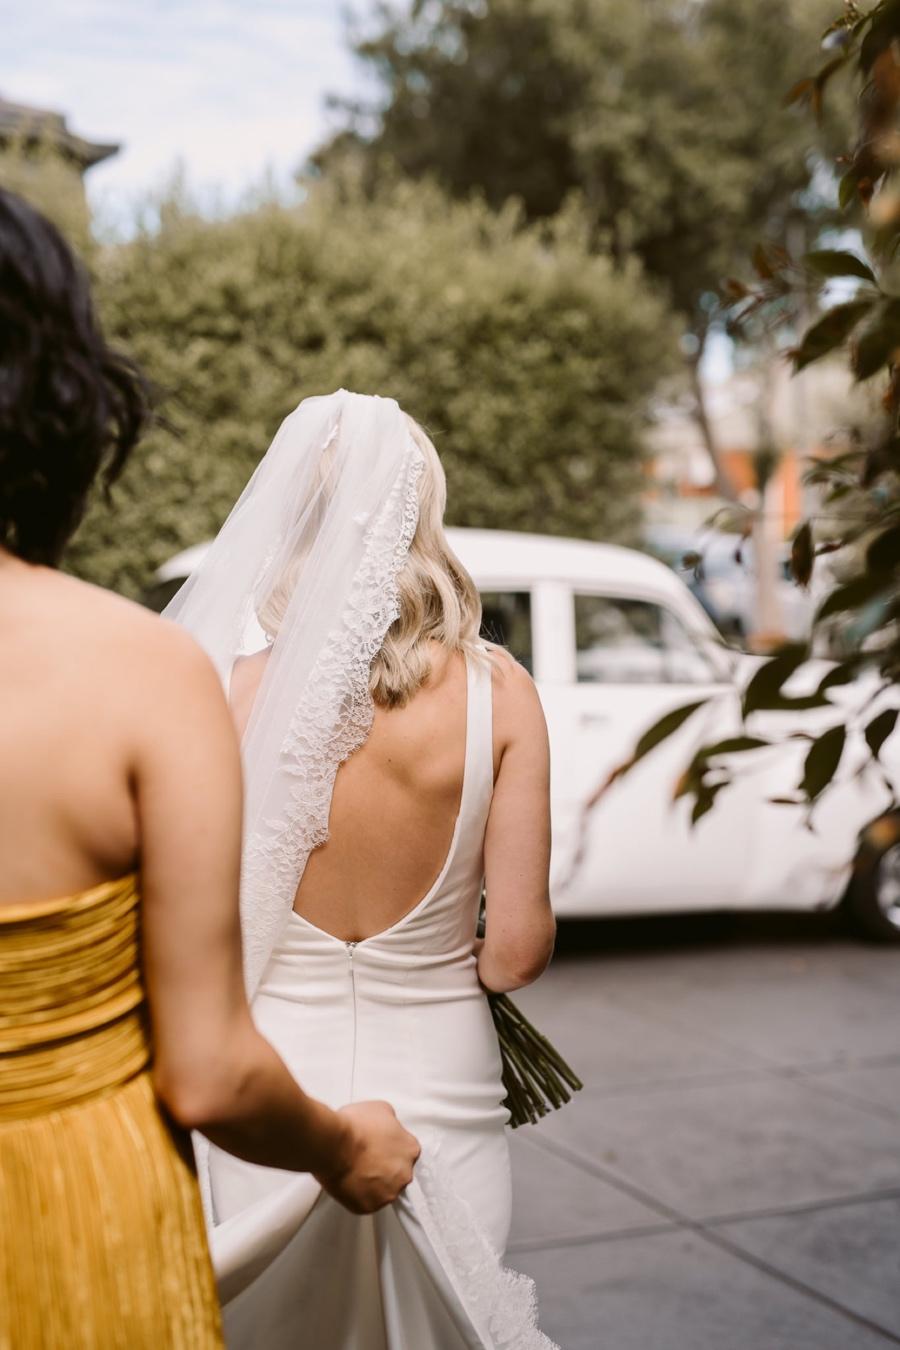 Quat Quatta Melbourne Wedding Photography35.jpg